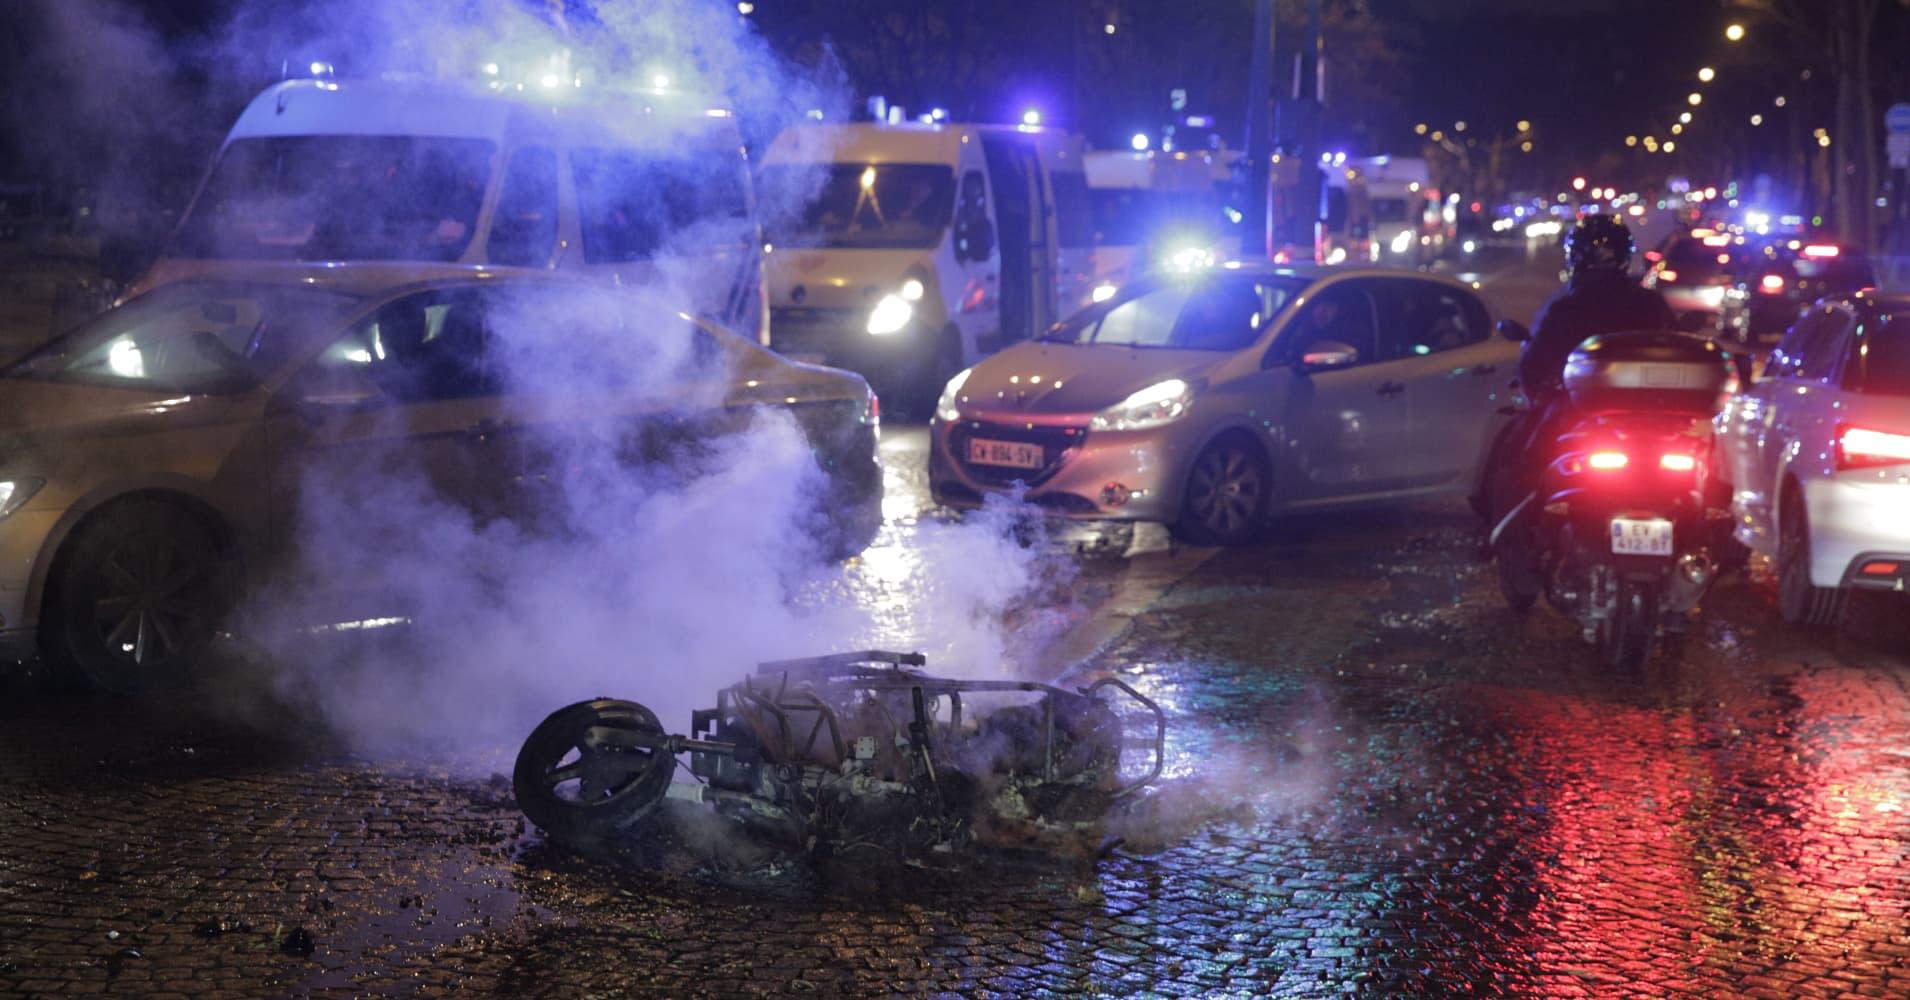 Clashes erupt in Paris as 'yellow vests' protest Emmanuel Macron